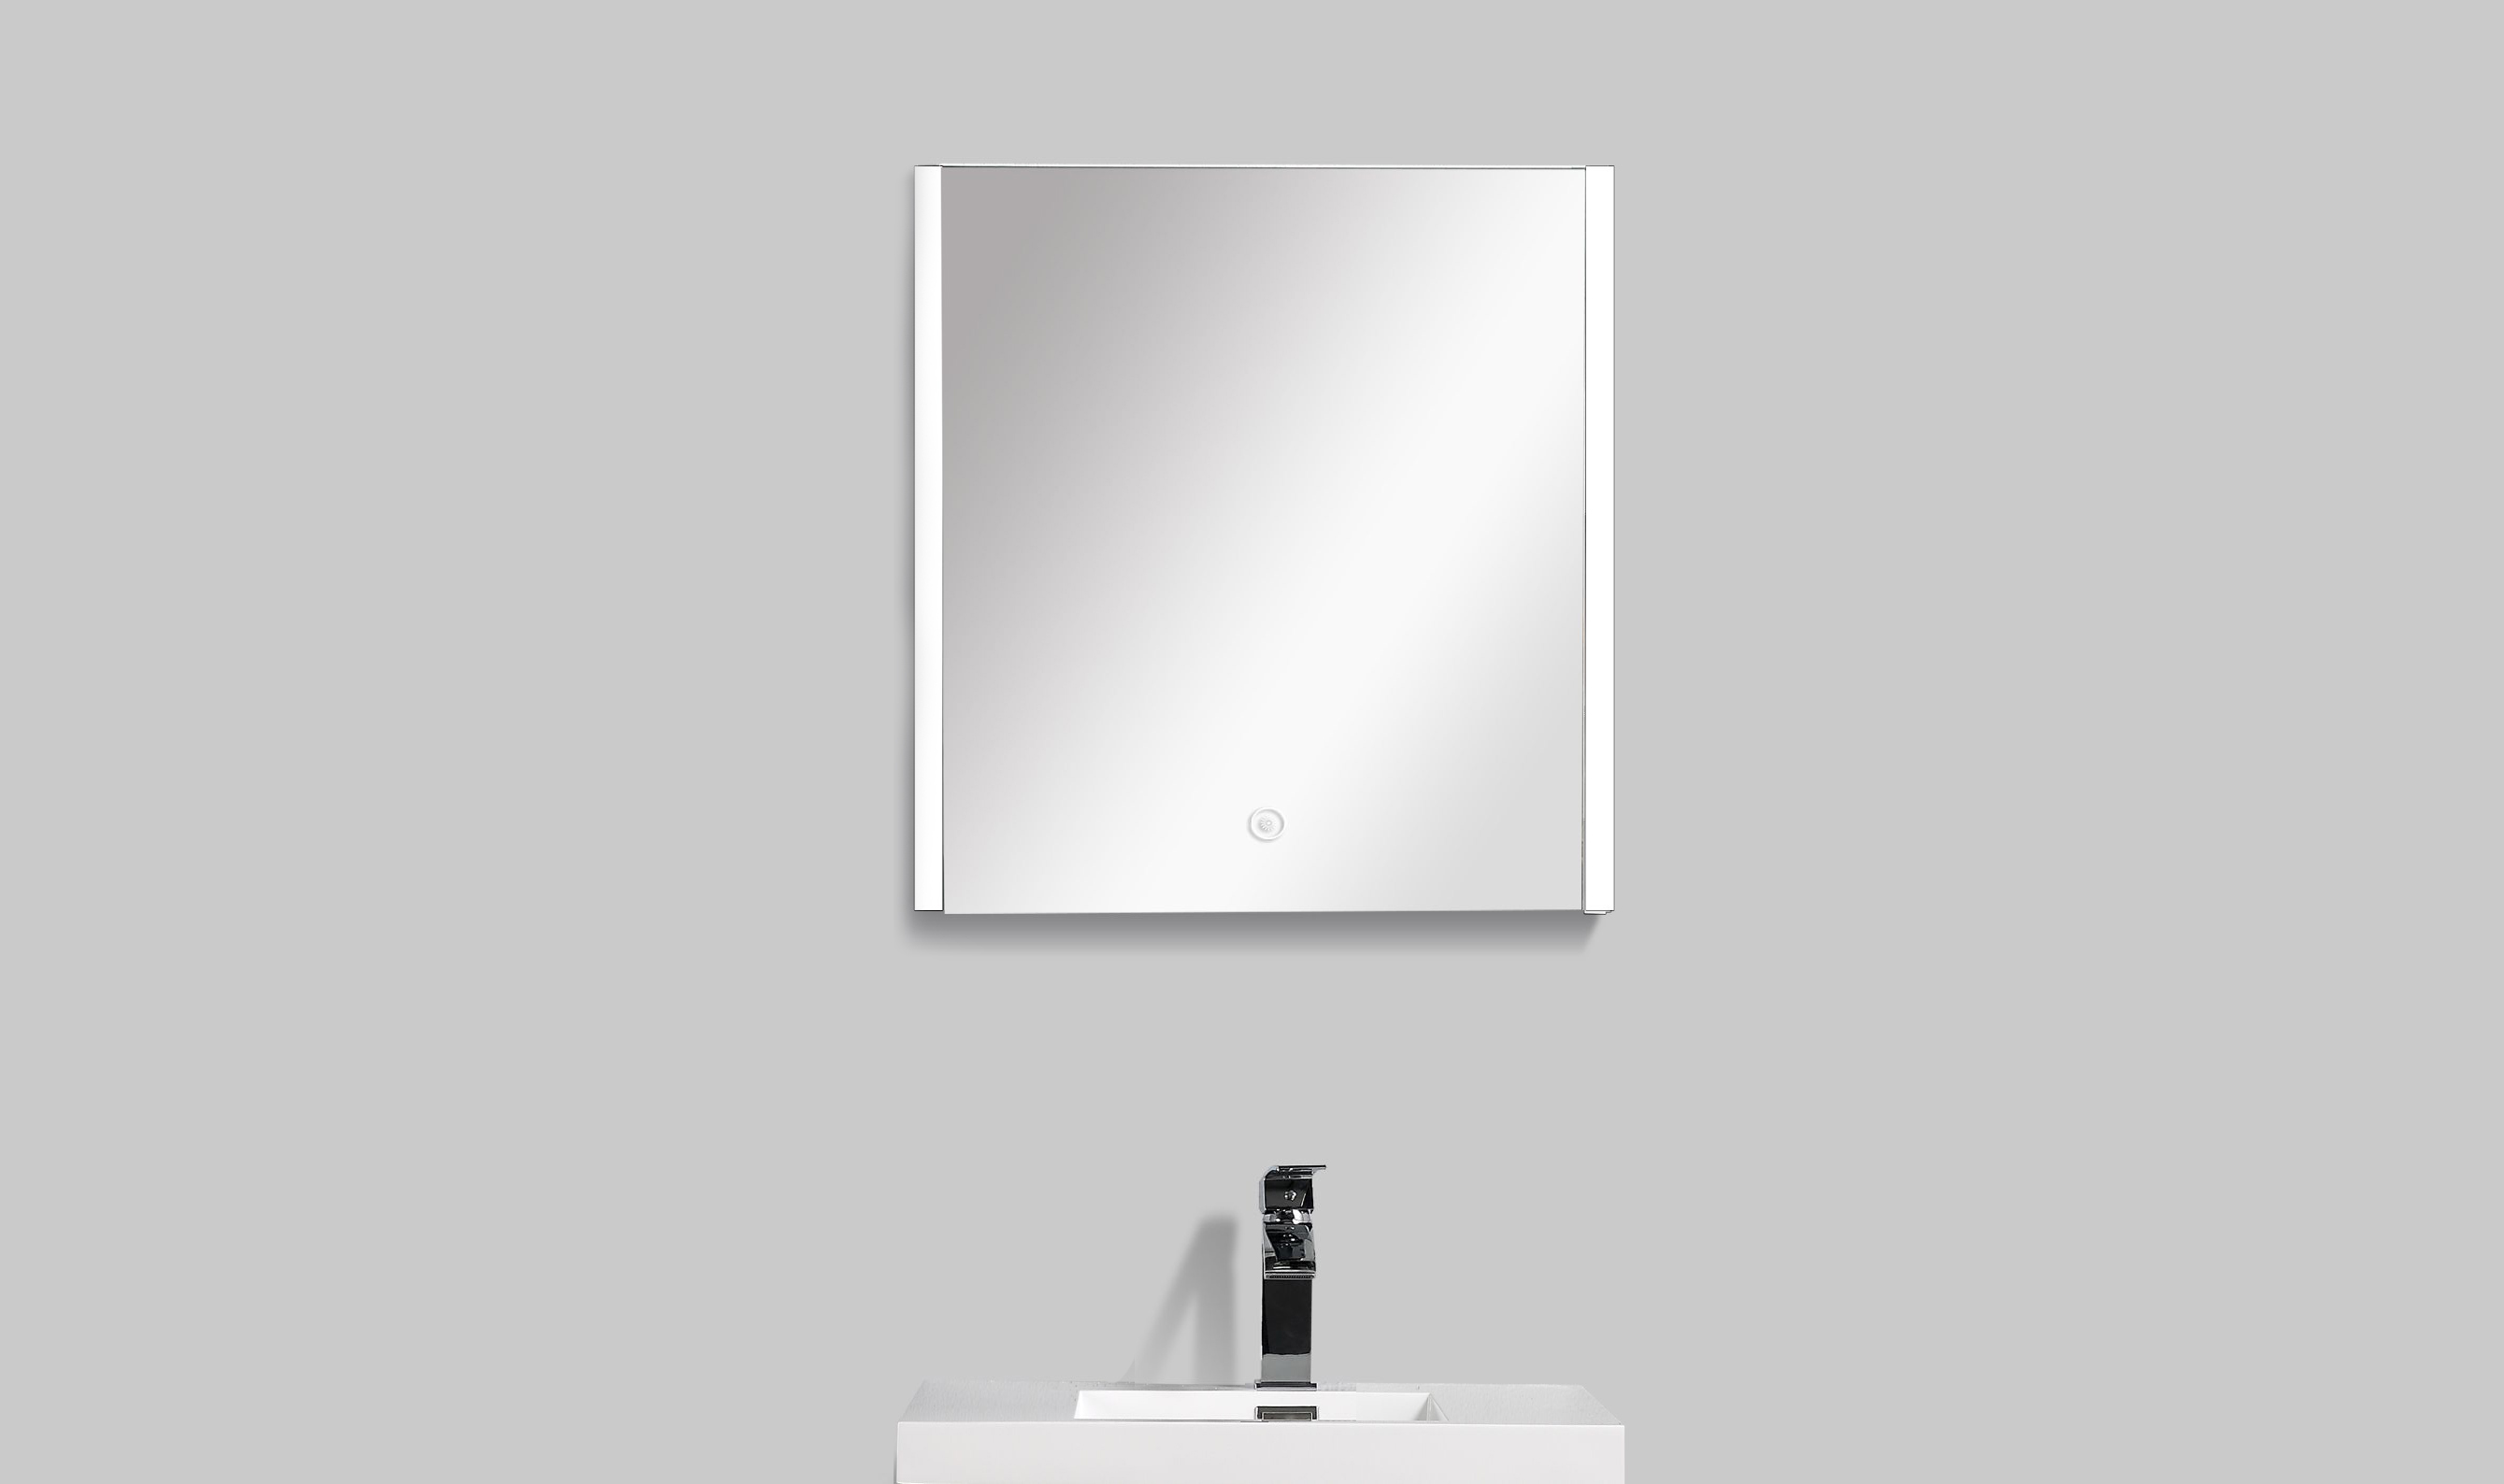 LED Badspiegel LED1-60